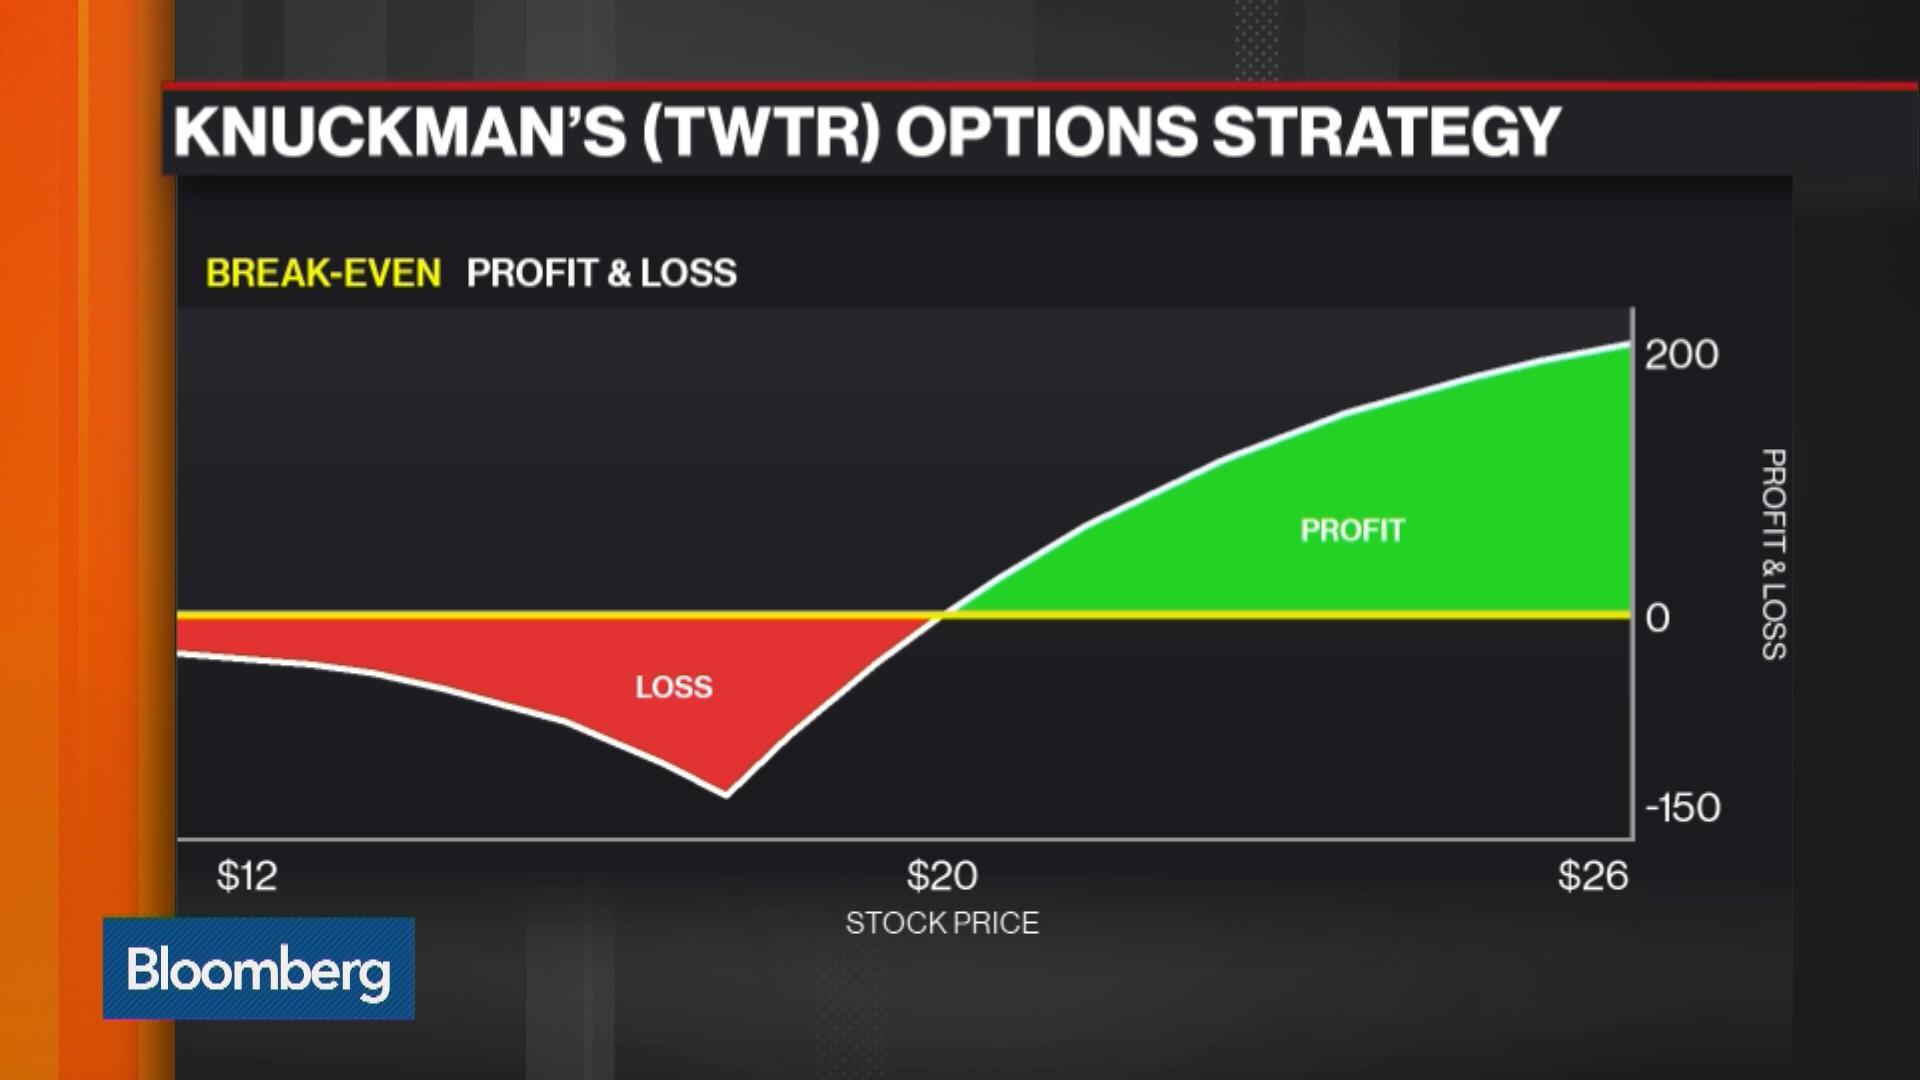 Twitter options trade